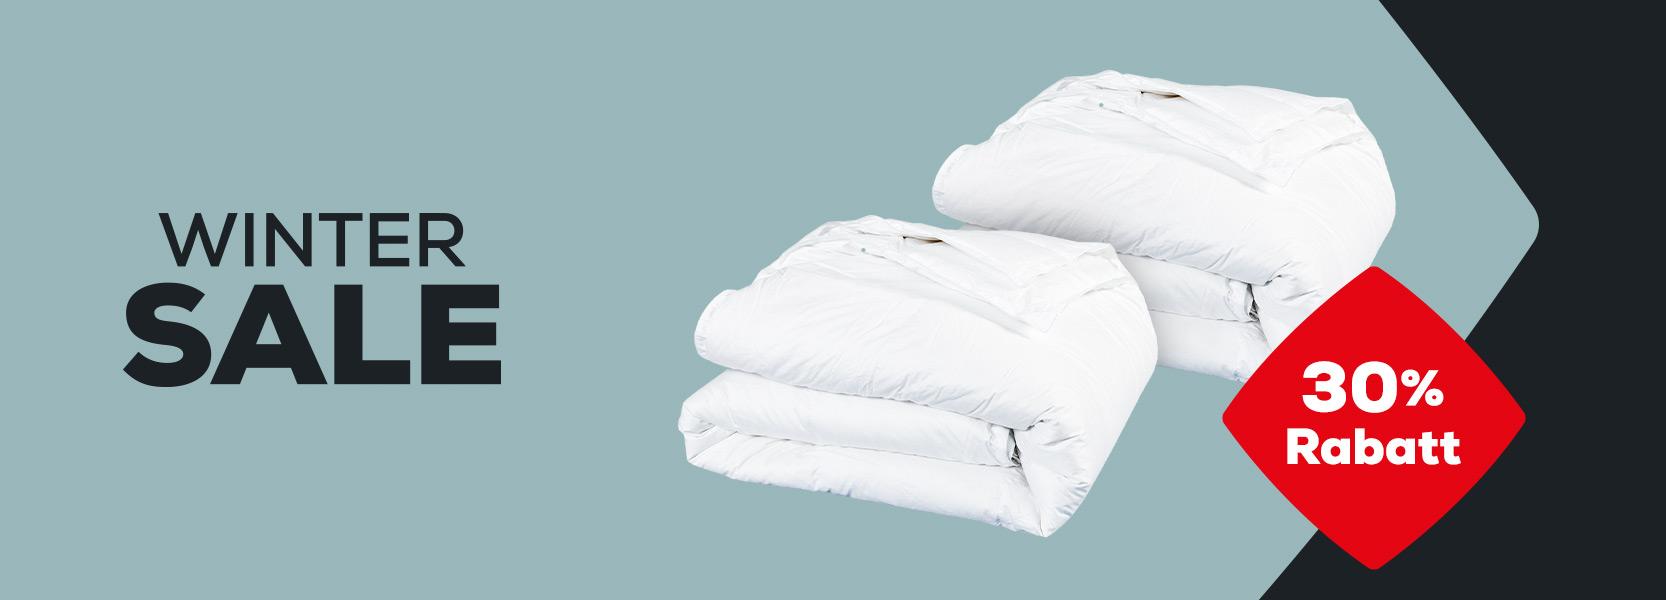 30% Rabatt auf Dixxius Bettdecken| Swiss Sense